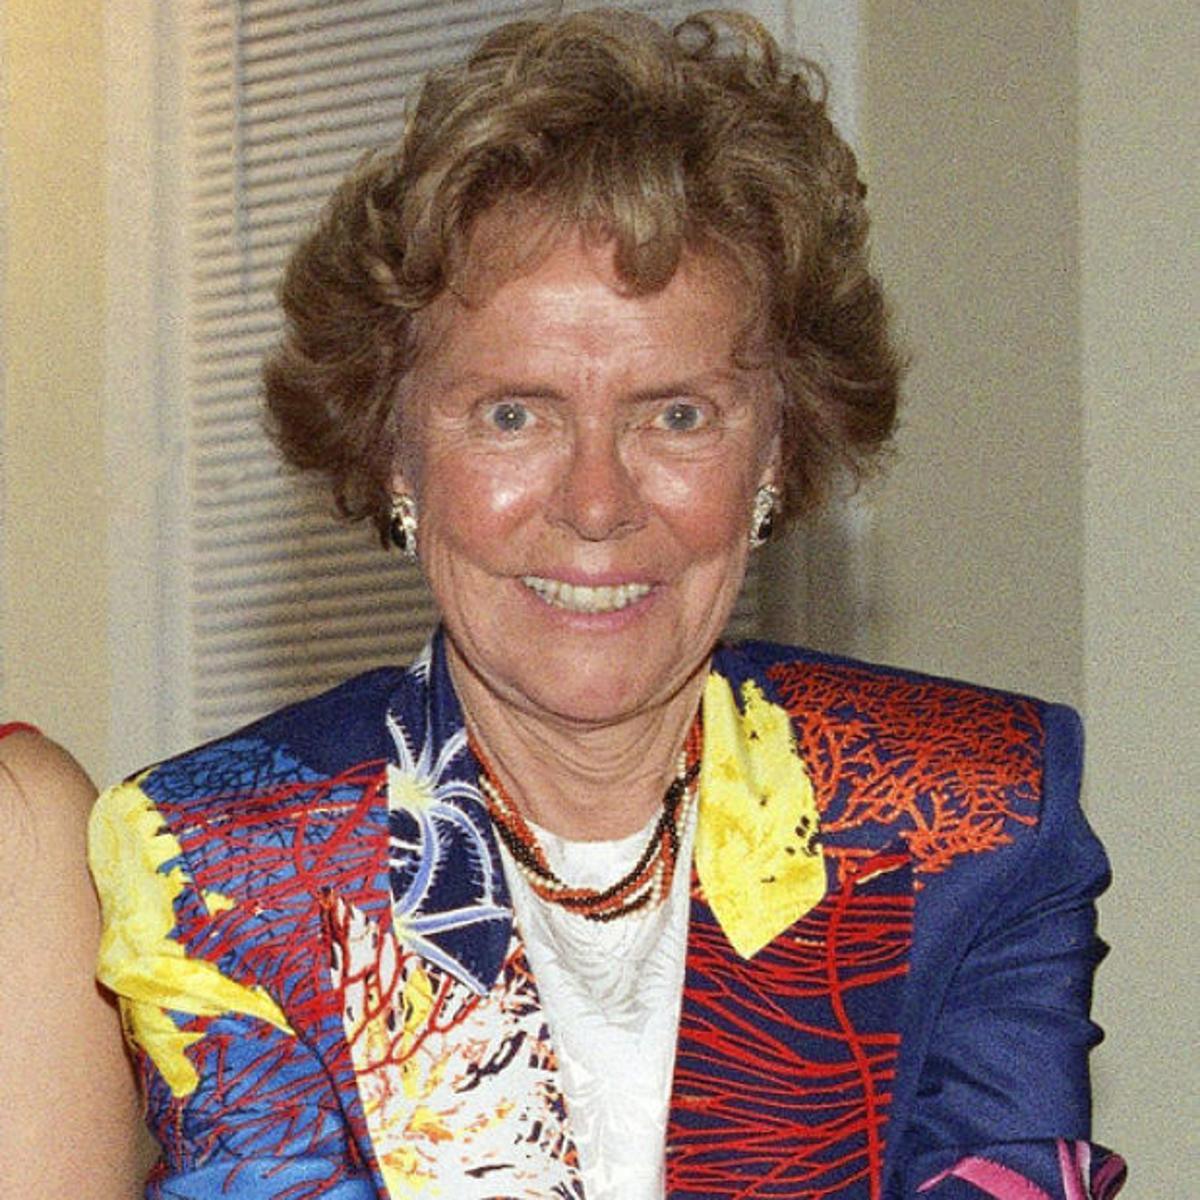 Ford Model Agency founder dies | Lifestyles | clintonherald com